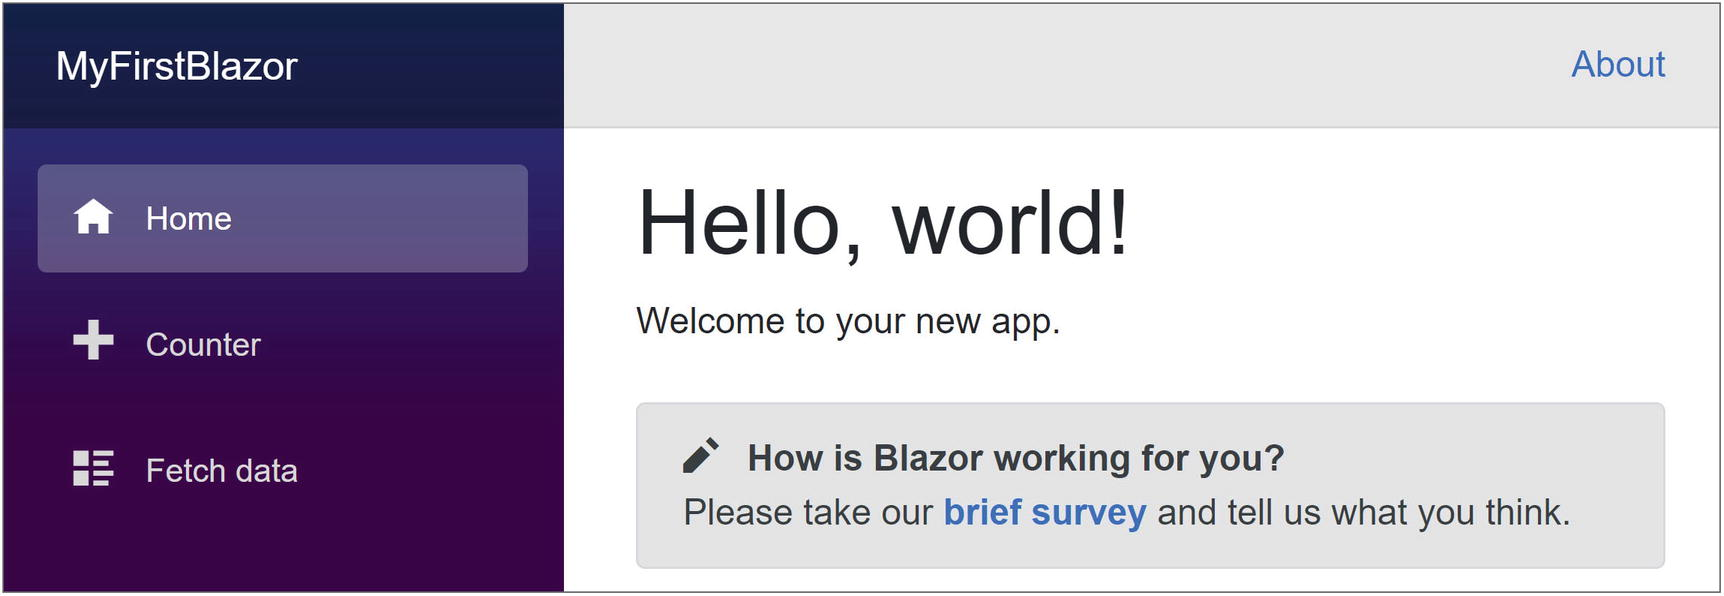 Your First Blazor Project   SpringerLink